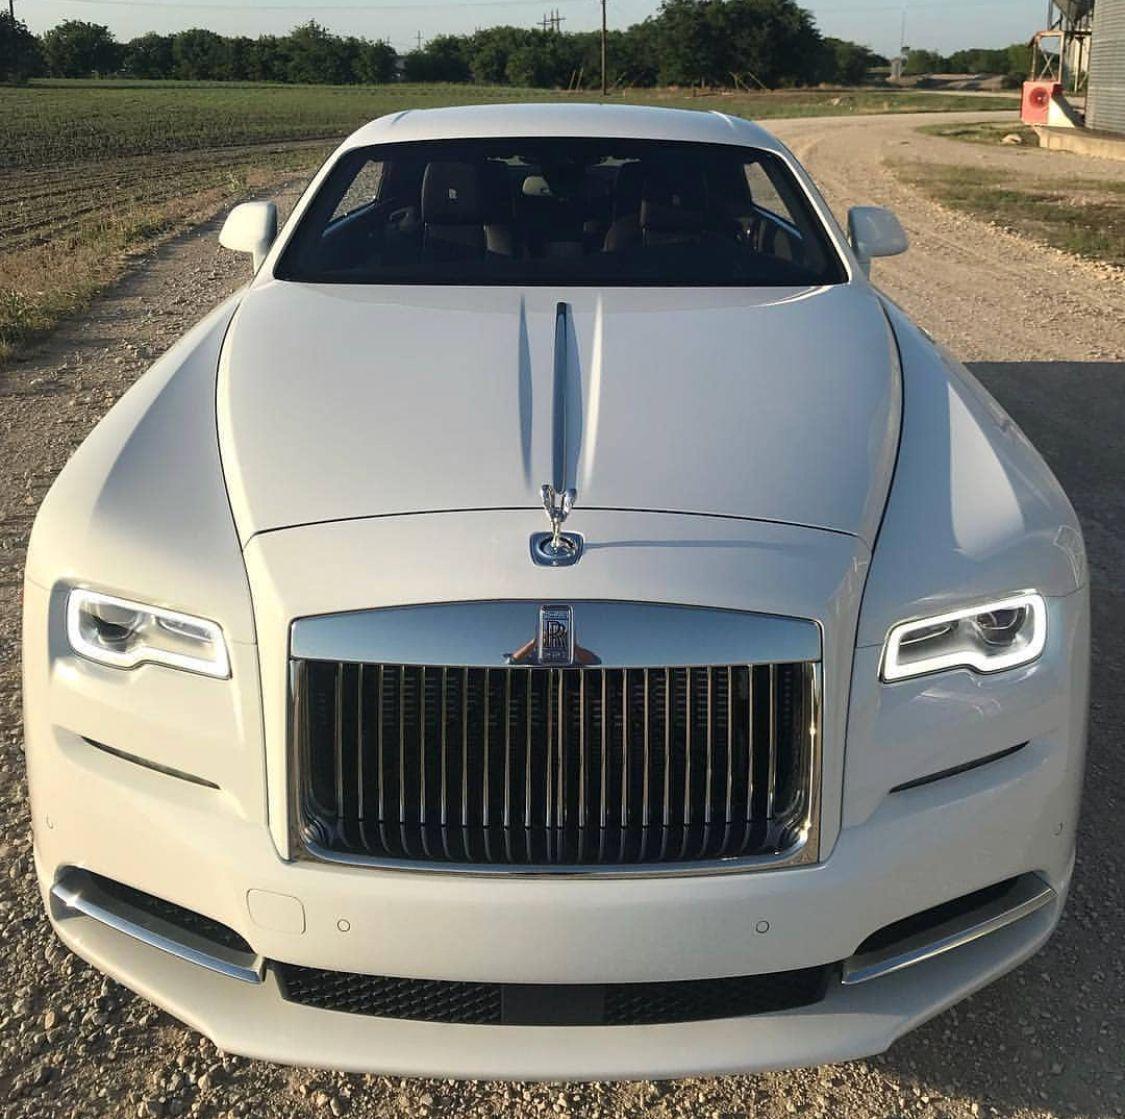 Pin By Mac Grandes Negocios On Rolls Royce Luxury Cars Rolls Royce Rolls Royce Luxury Cars